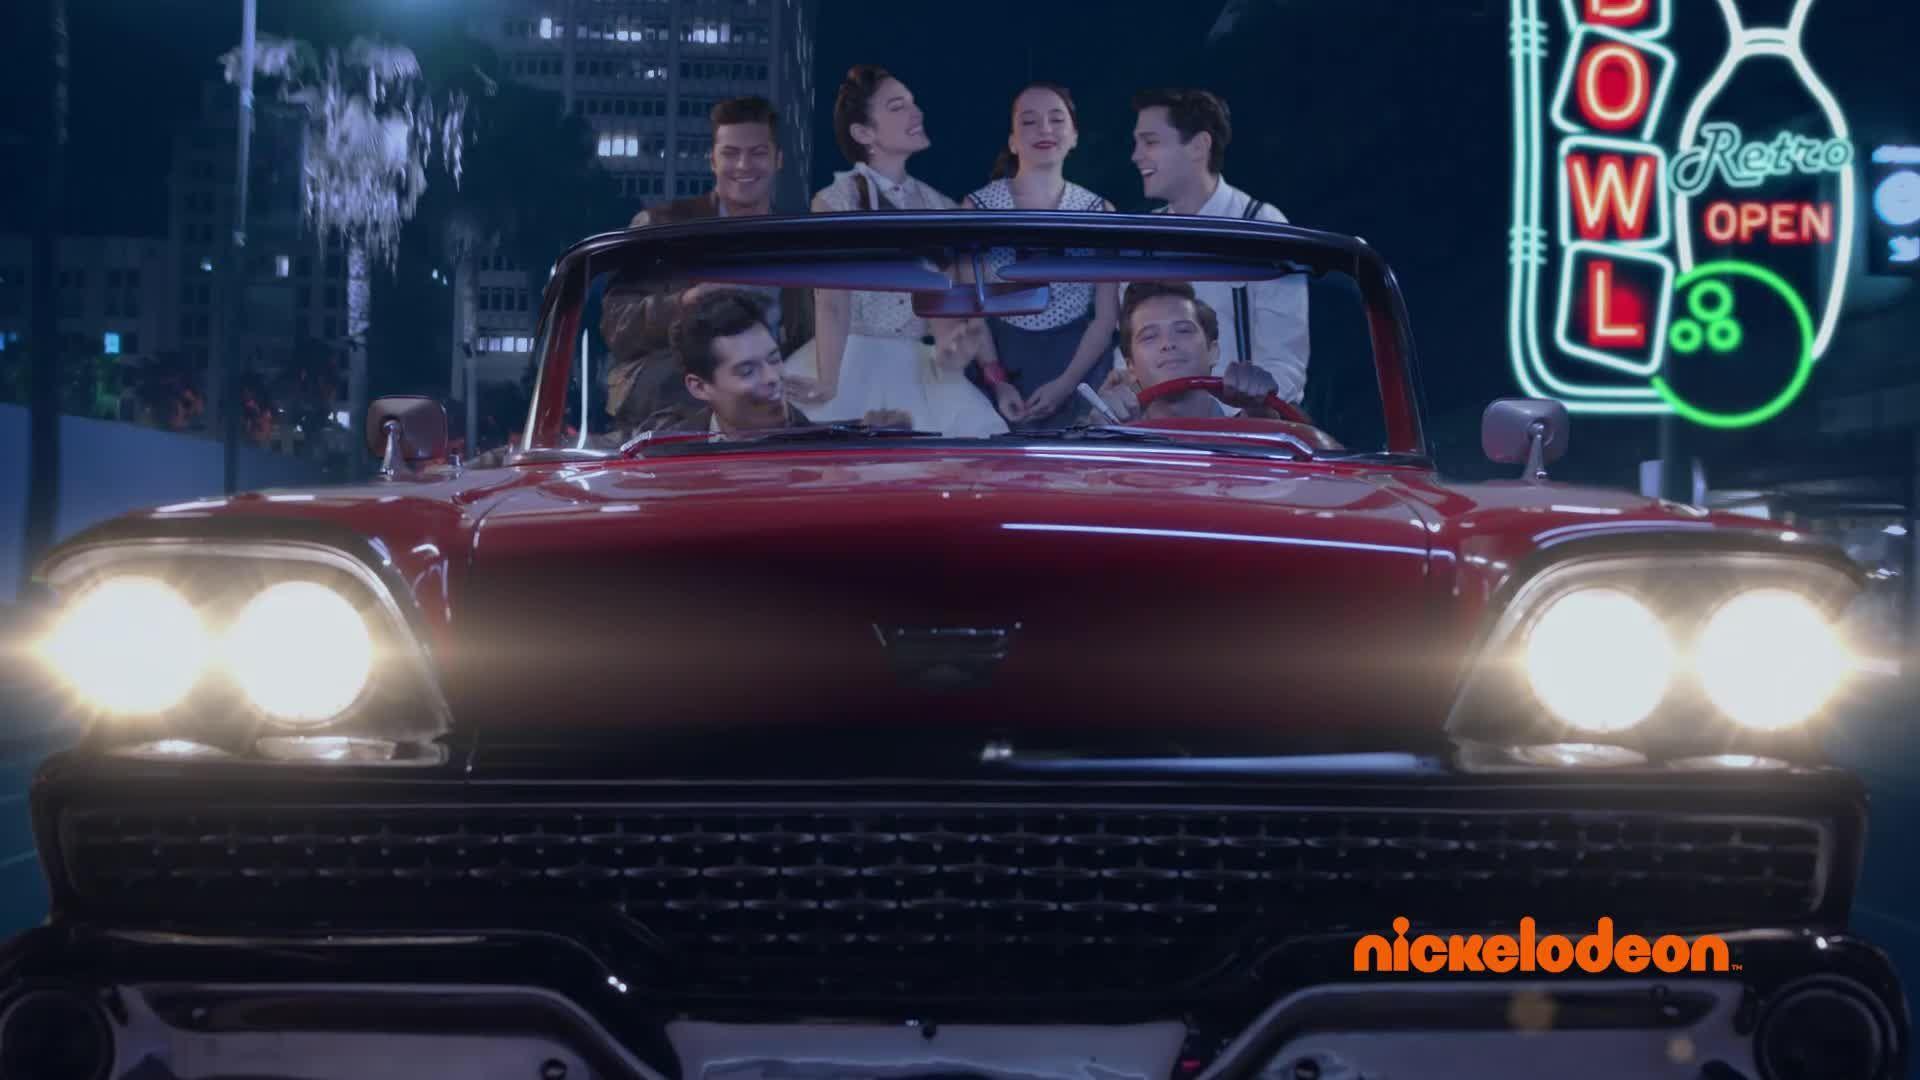 CLUB 57  Sries  Mundonickcom  Nickelodeon